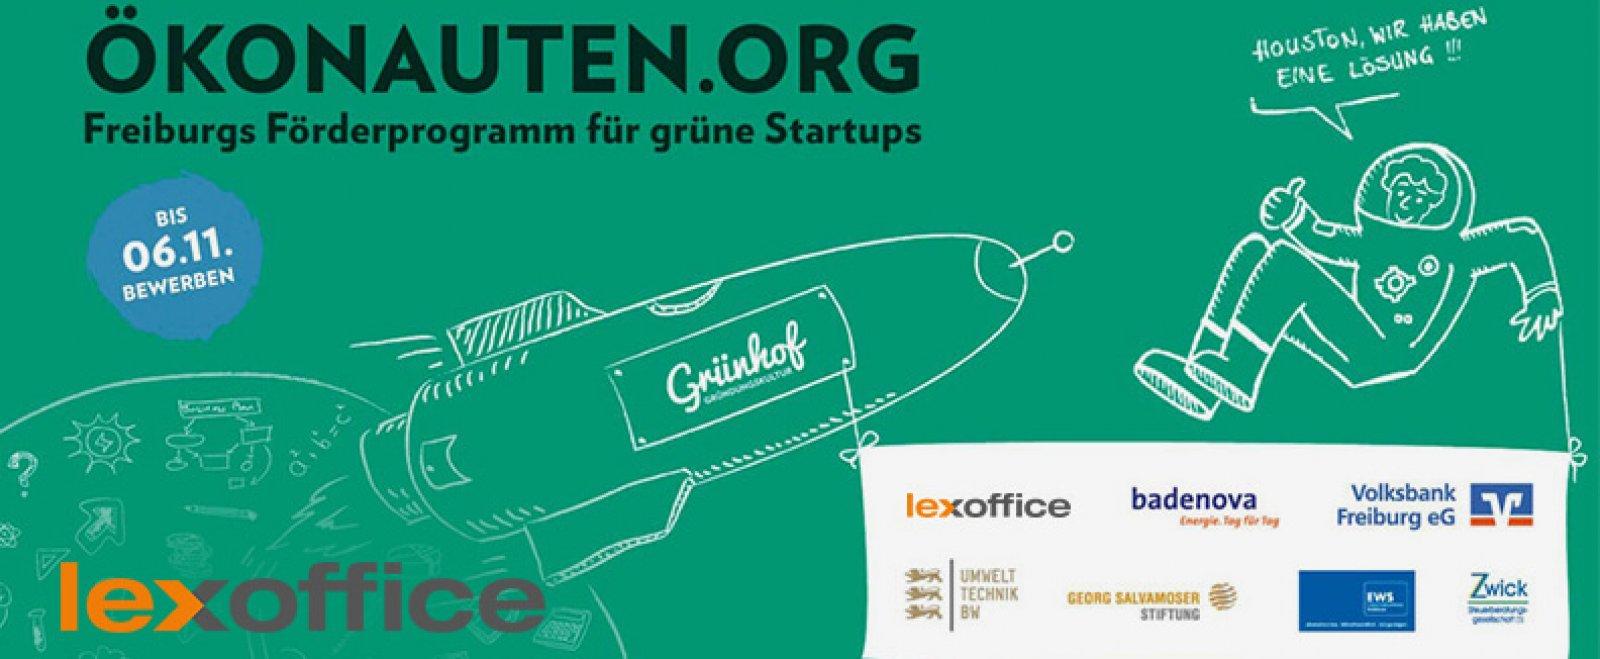 lexoffice ist Partner des Ökonauten Förderprogramms für Start-ups